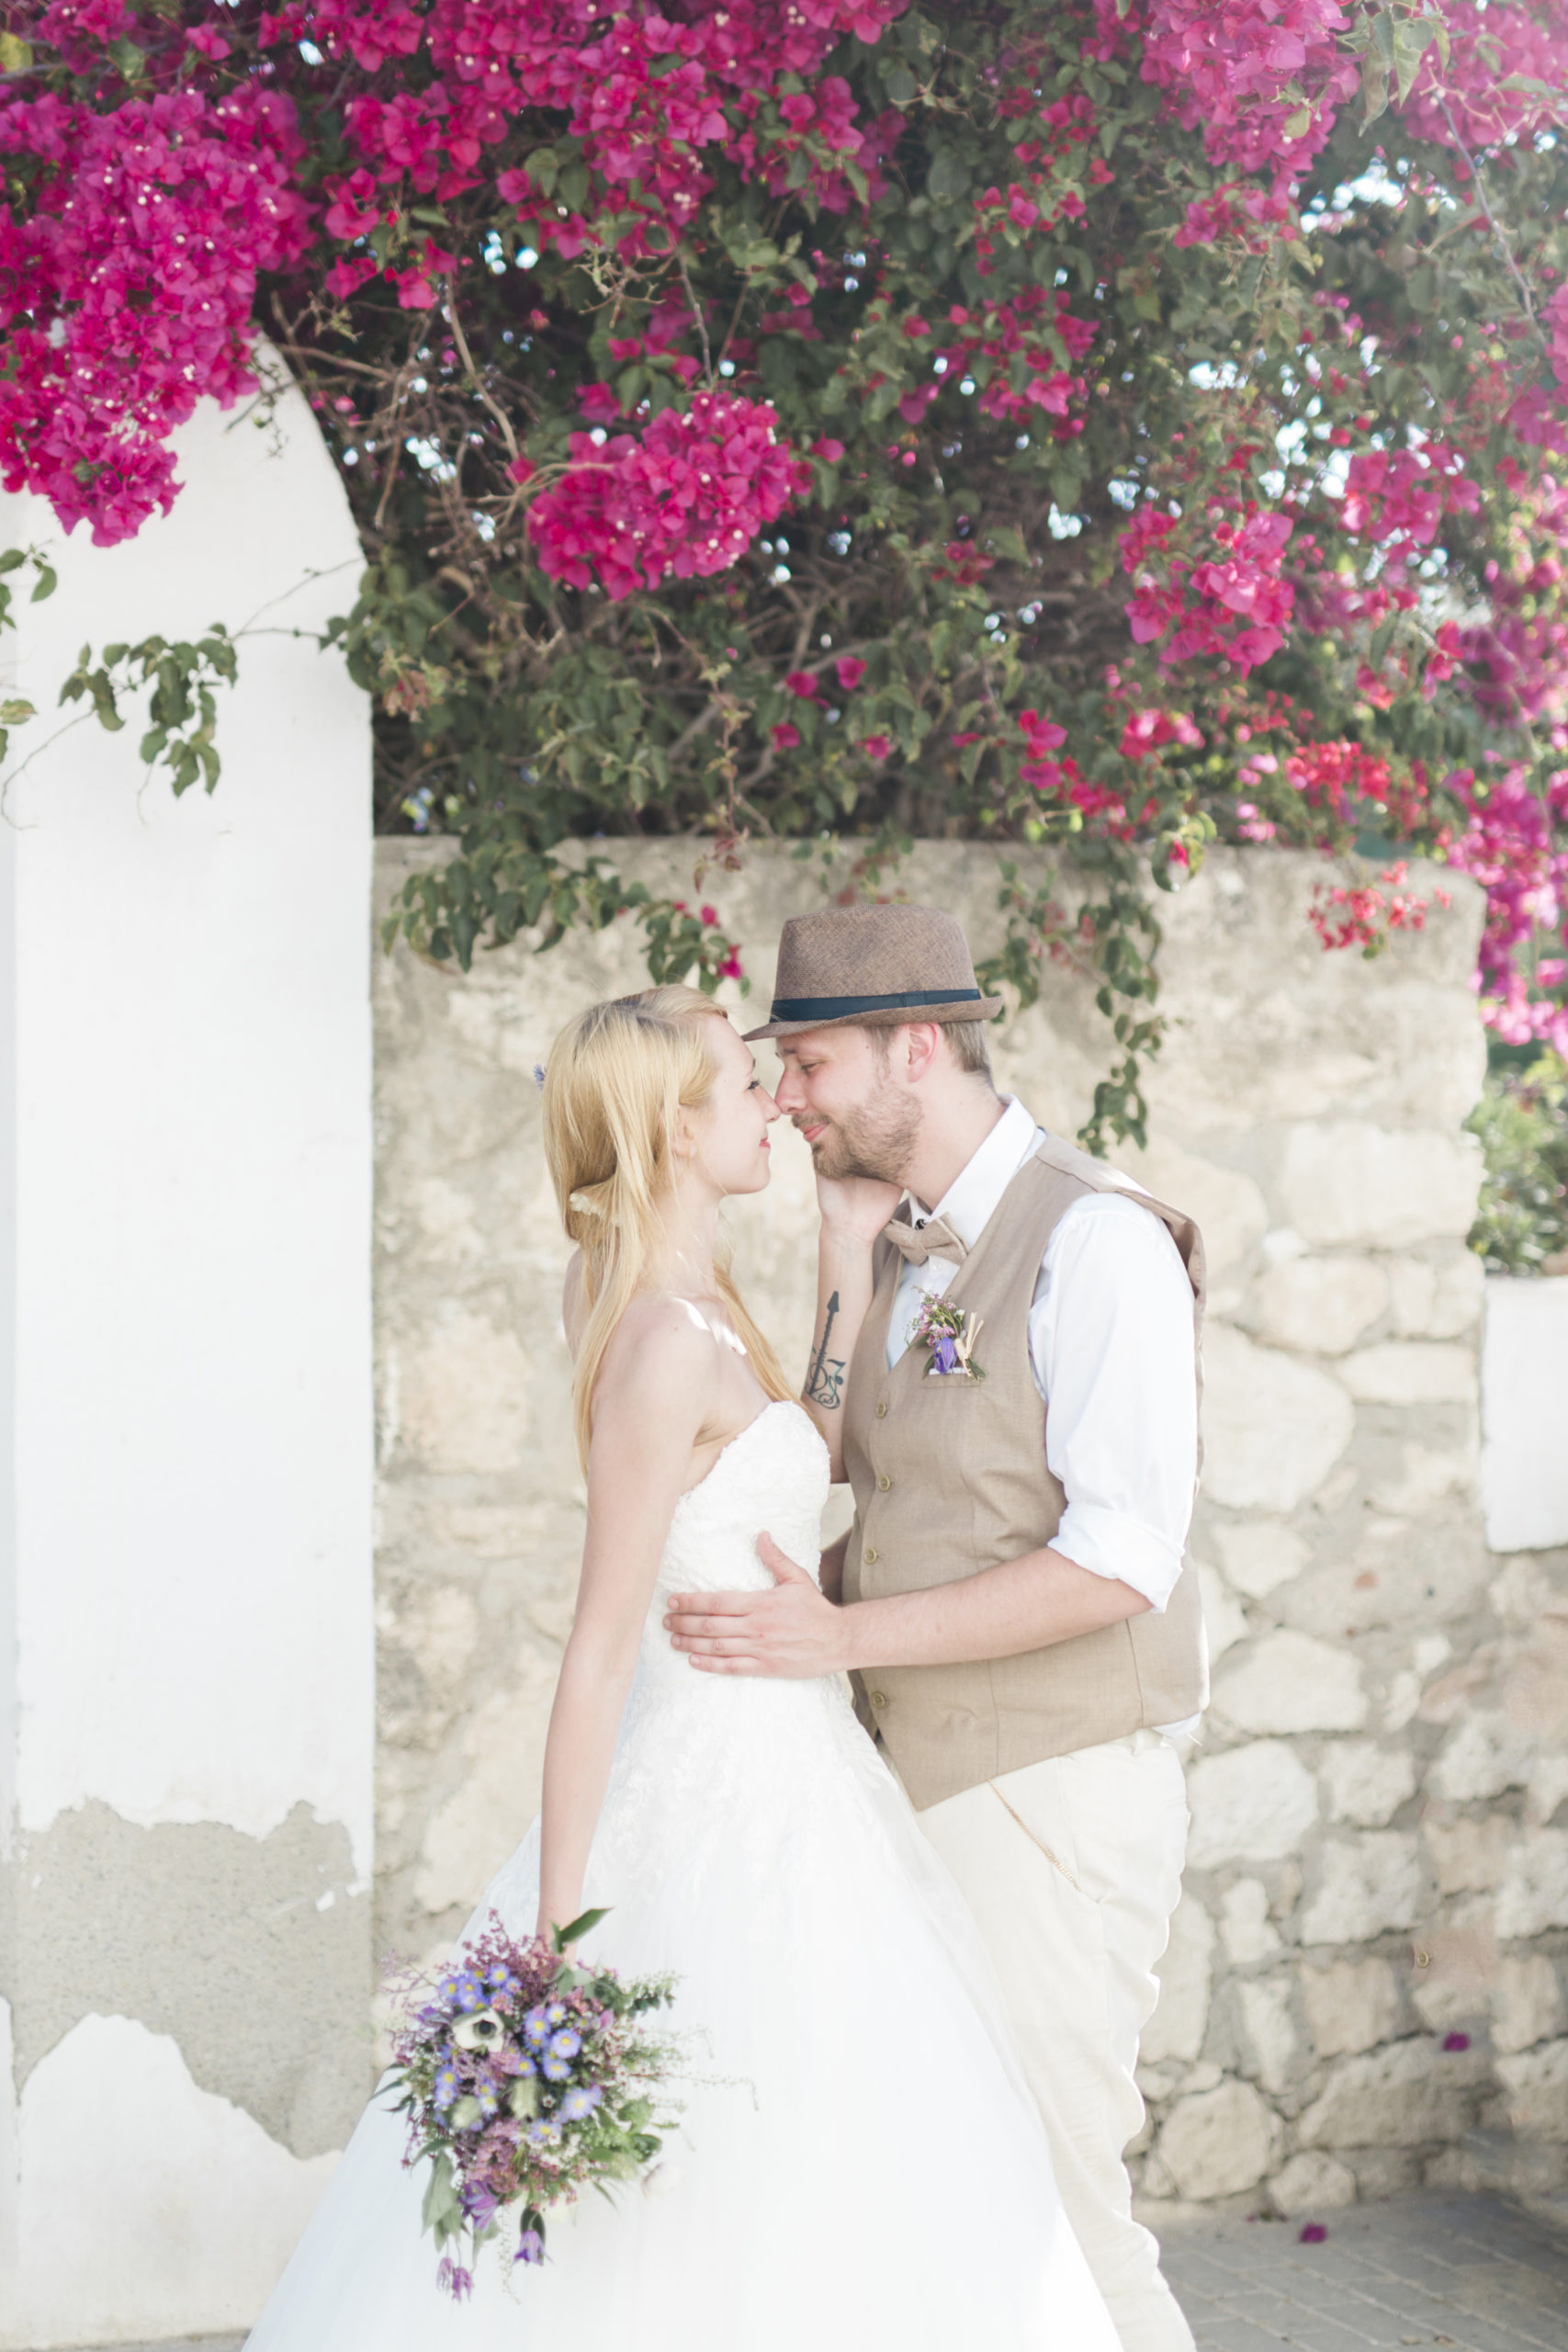 Romantisch heiraten am Meer – Real Wedding Anna & Marcel